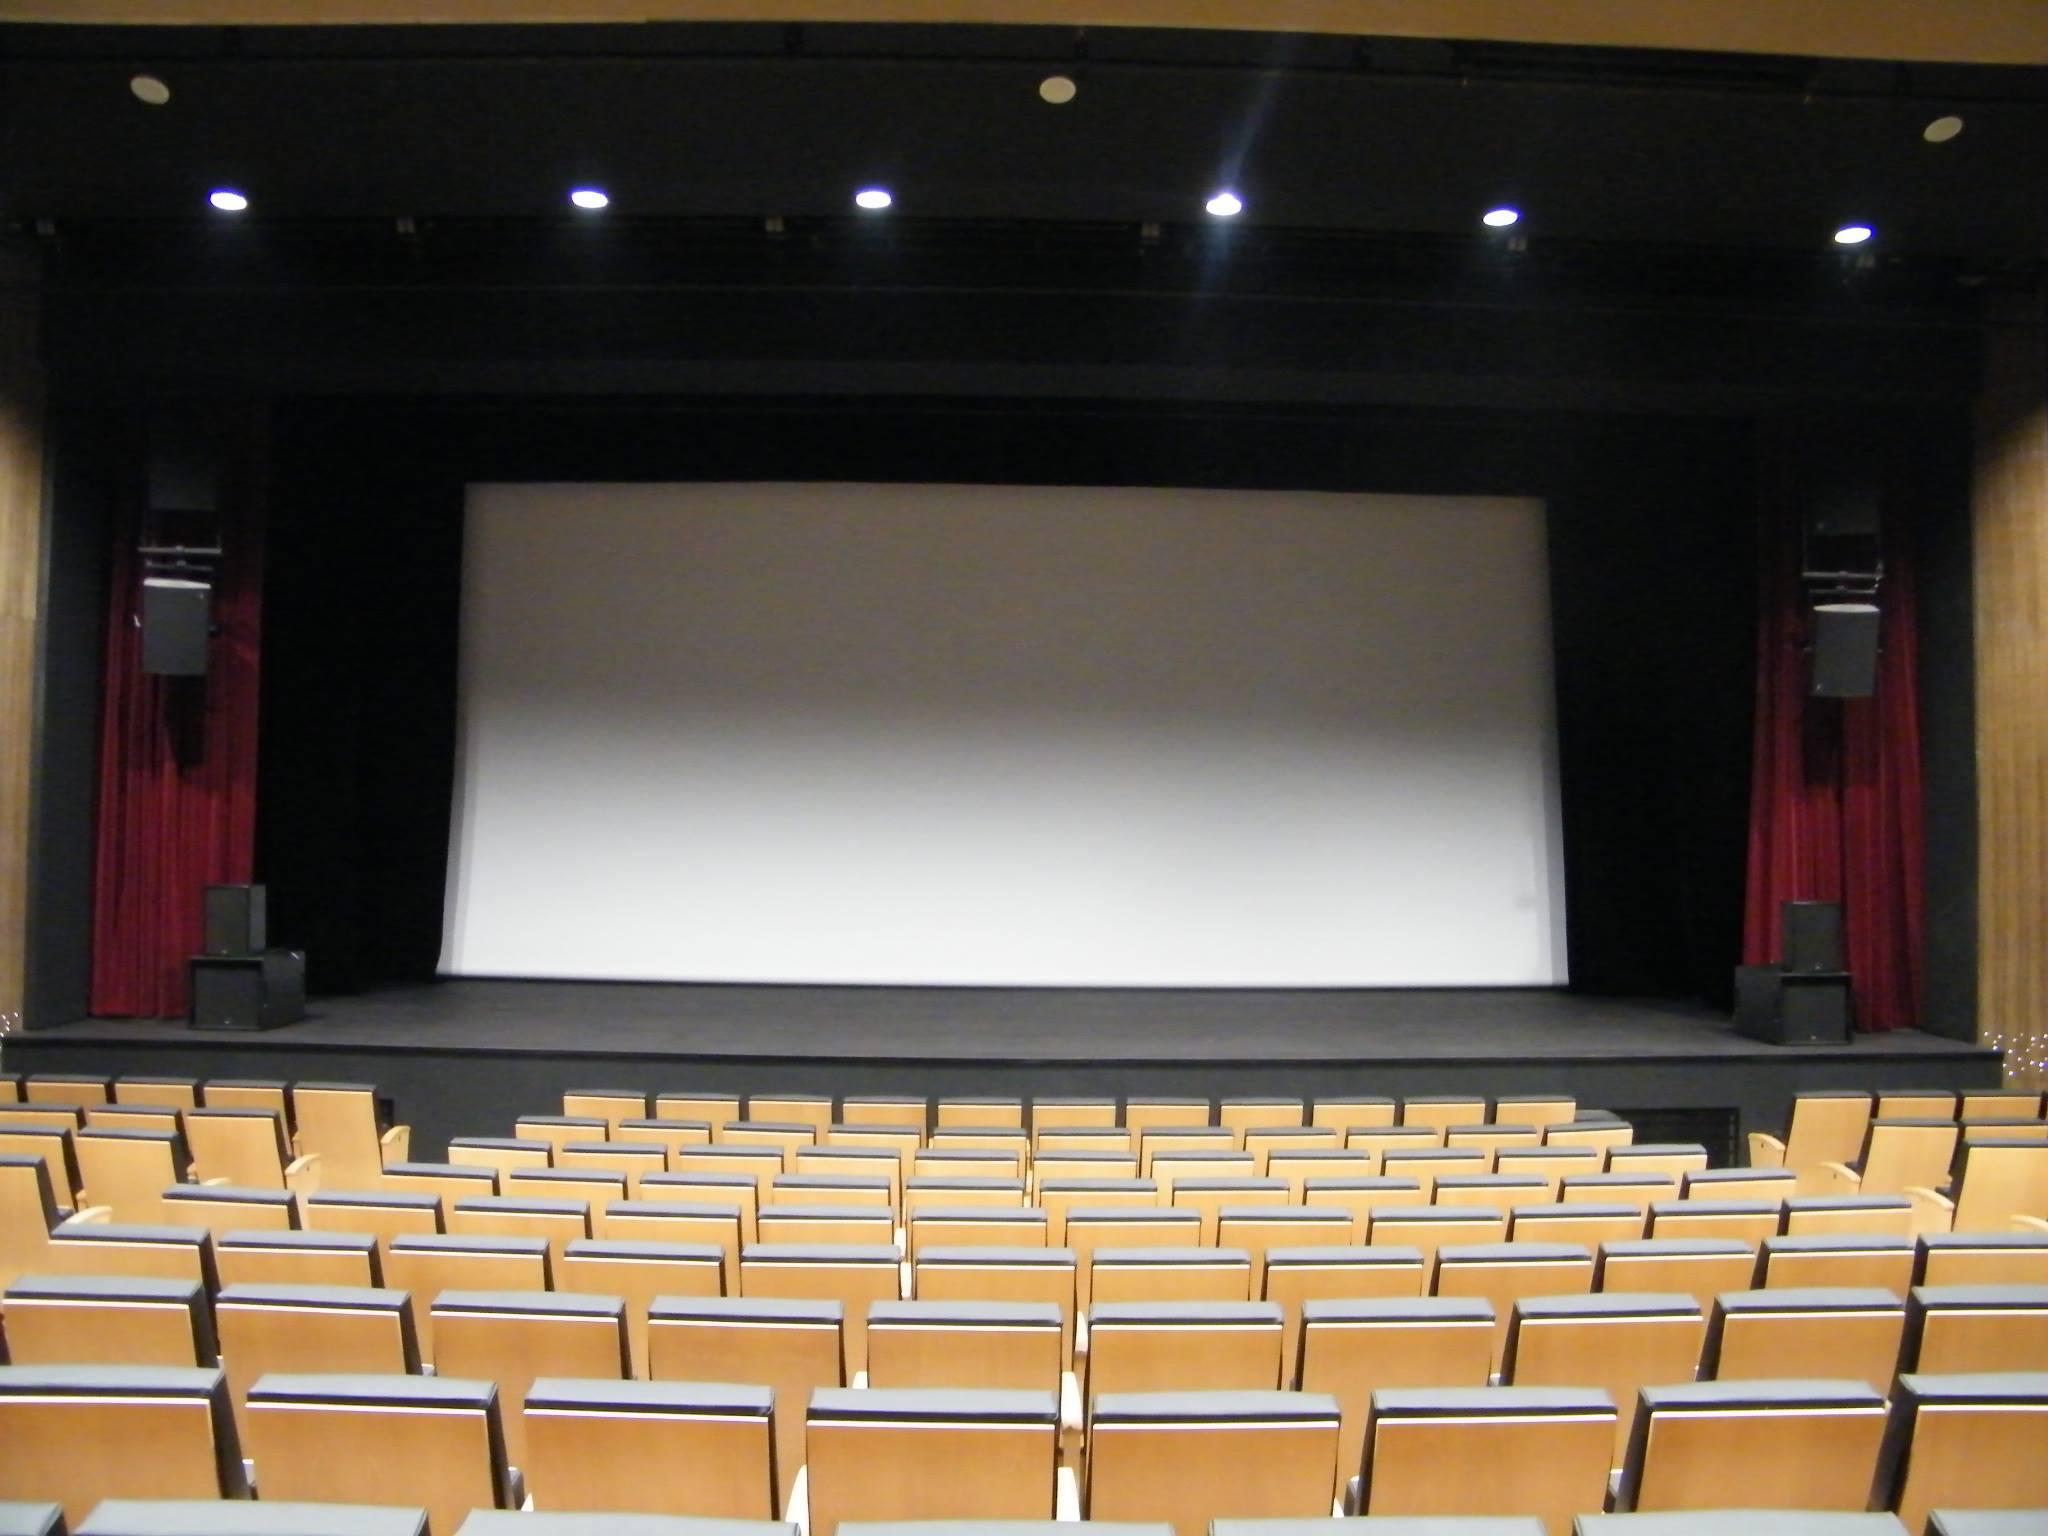 Cinéma à l'Espace Diamant novembre 2018